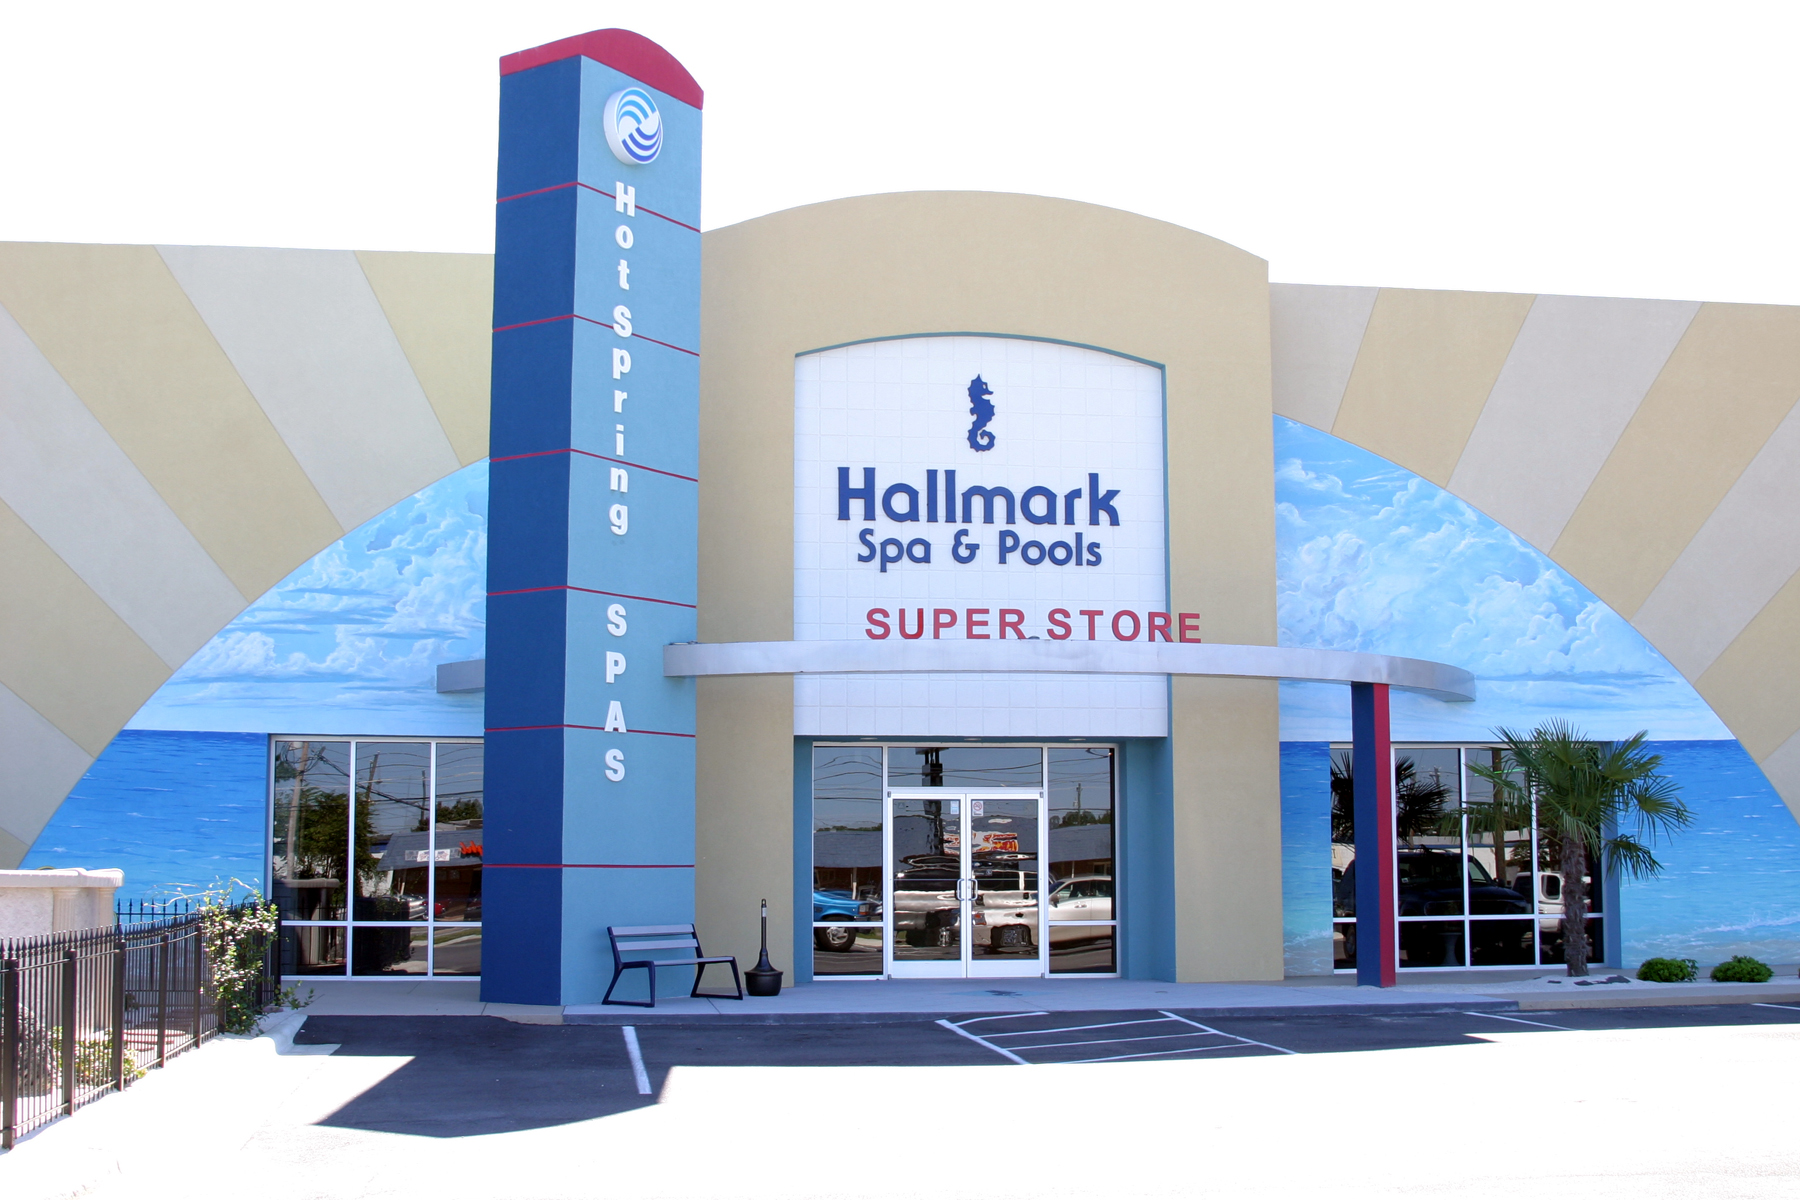 Hallmark Spa & Pools, Fayetteville NC